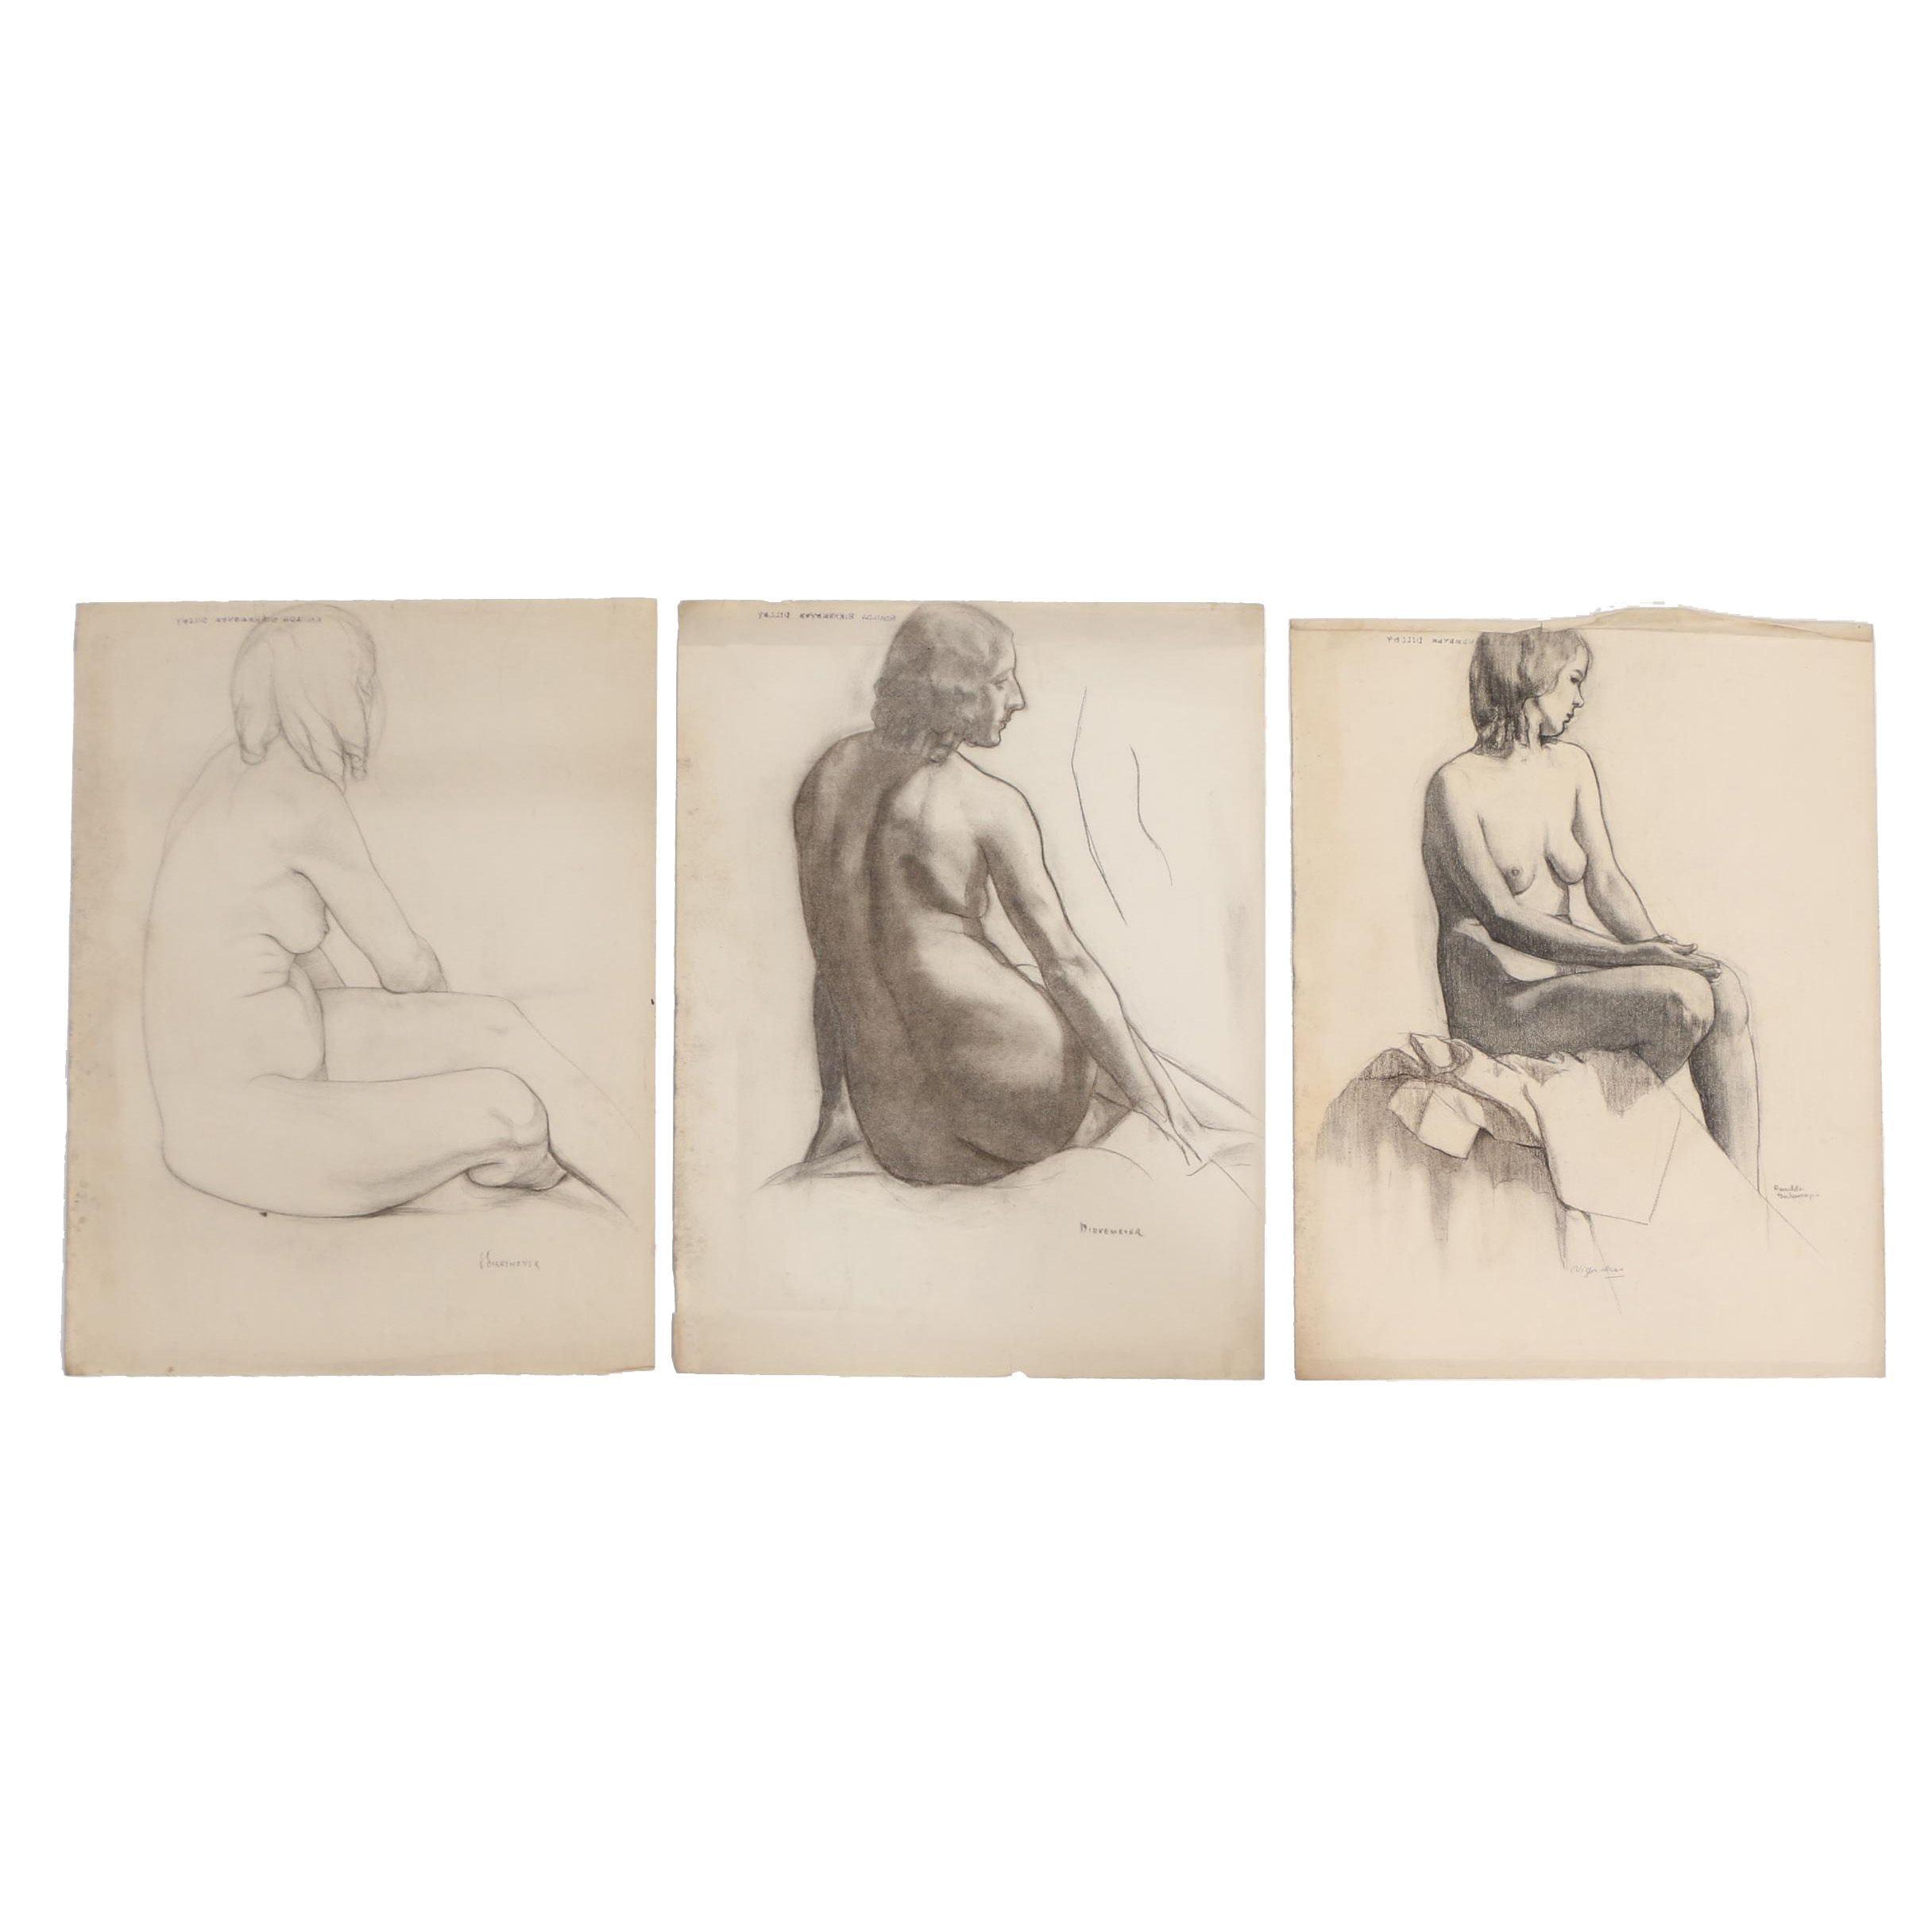 Romilda Birkemeyer Dilley Charcoal Drawings of Figural Studies